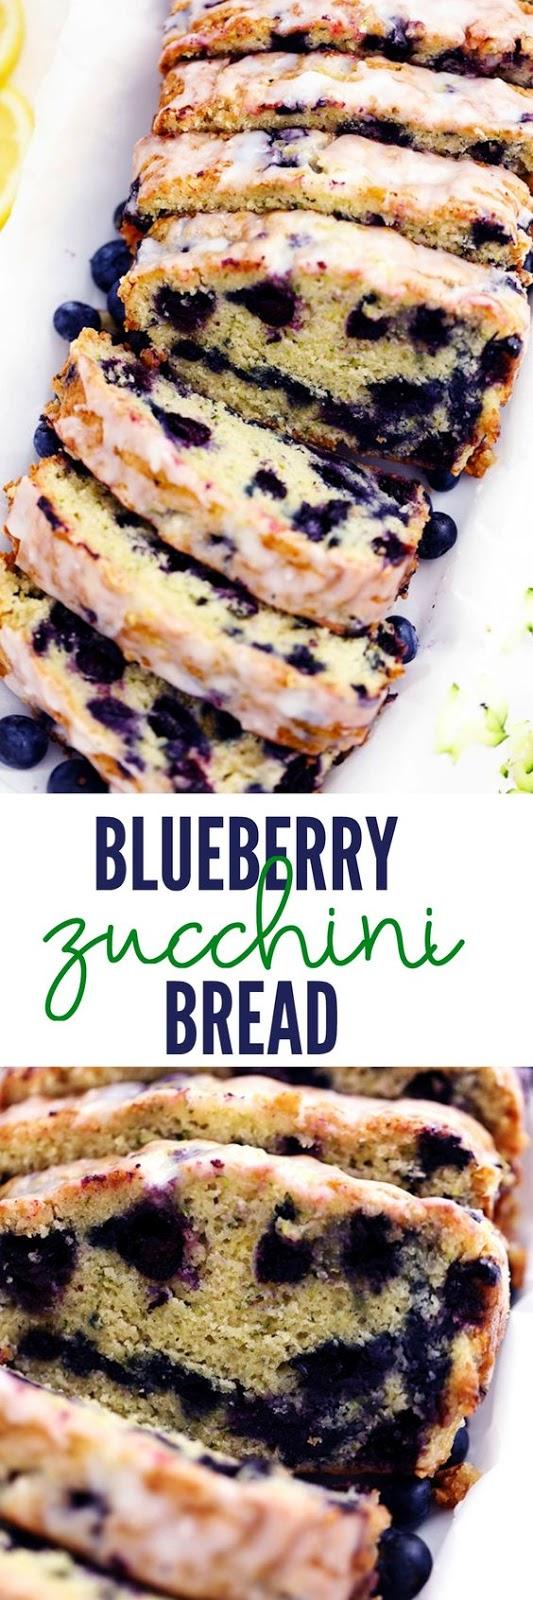 BLUEBERRY ZUCCHINI BREAD WITH A LEMON GLAZE #DESSERT